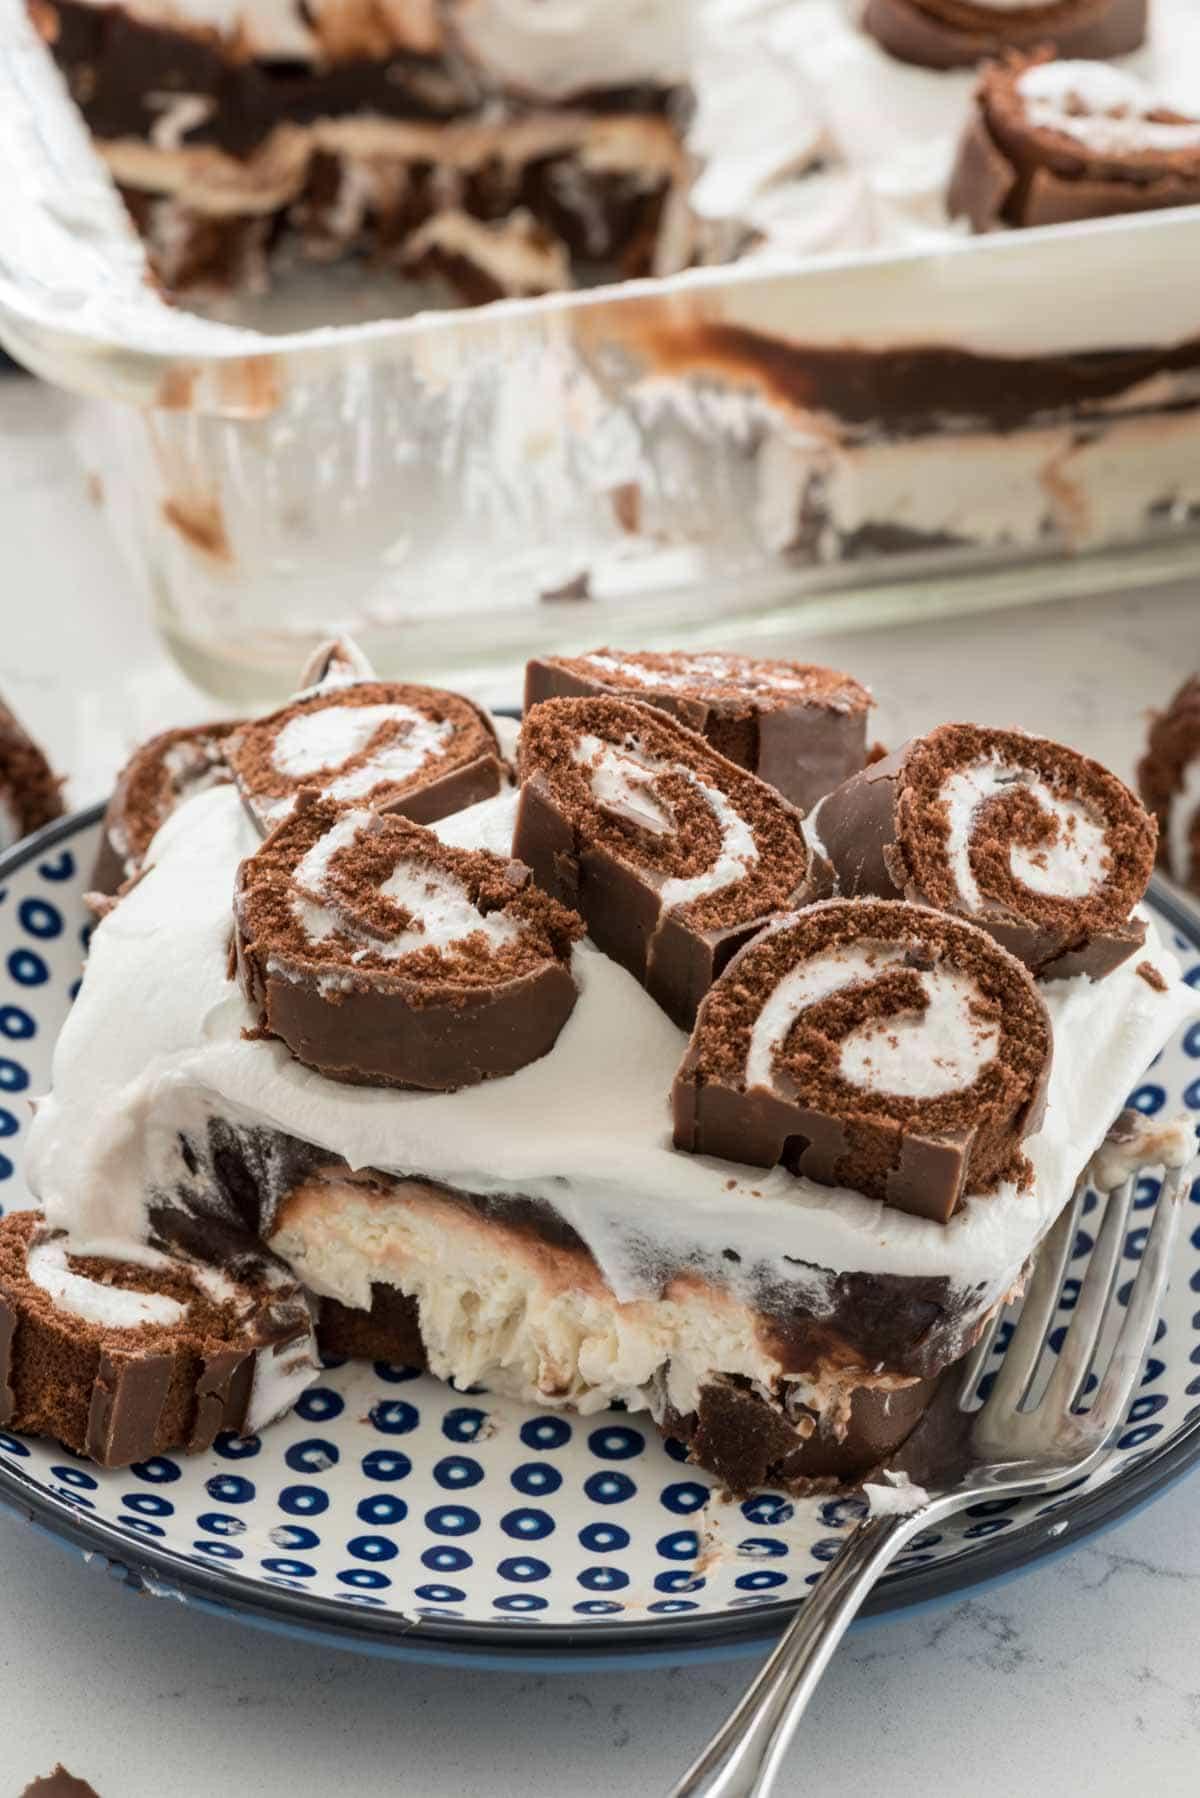 Swiss Roll Layered No Bake Dessert